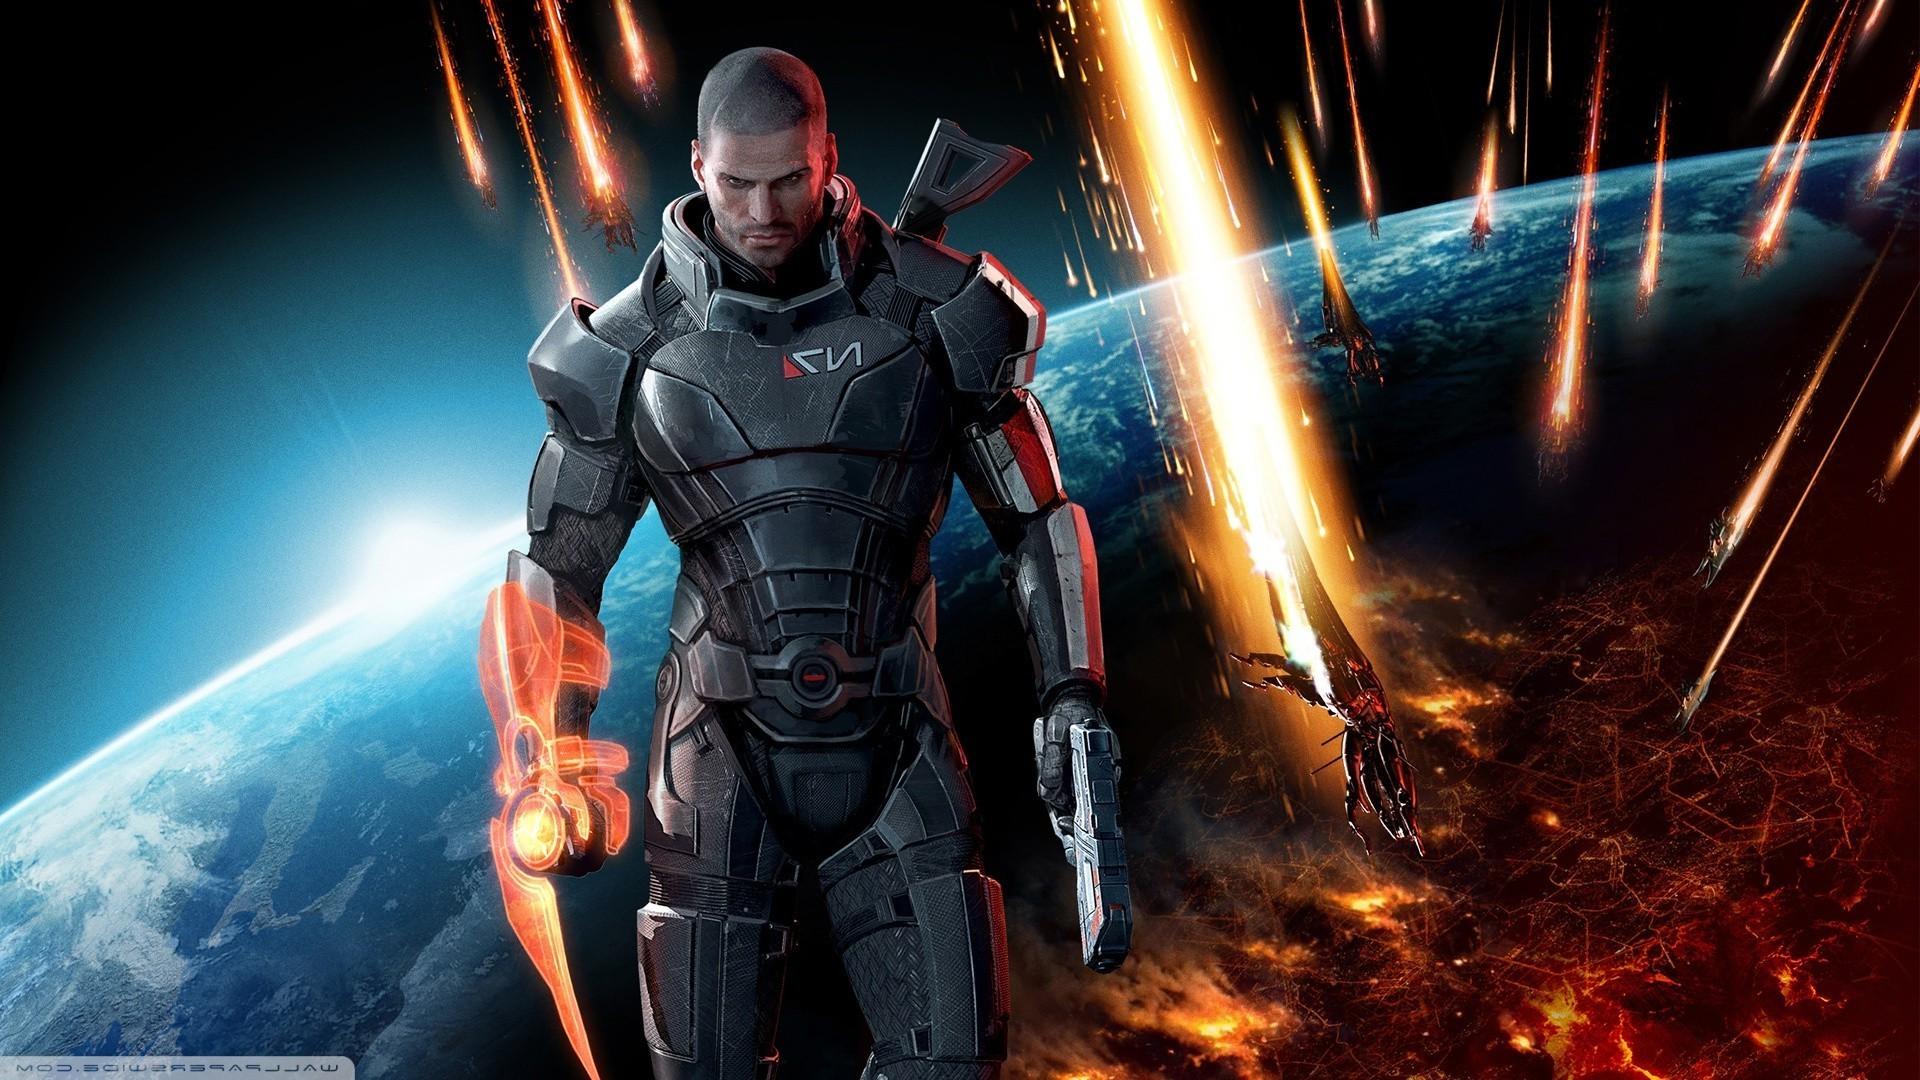 Mass Effect, Video Games, Mass Effect 3 Wallpapers HD / Desktop and Mobile  Backgrounds